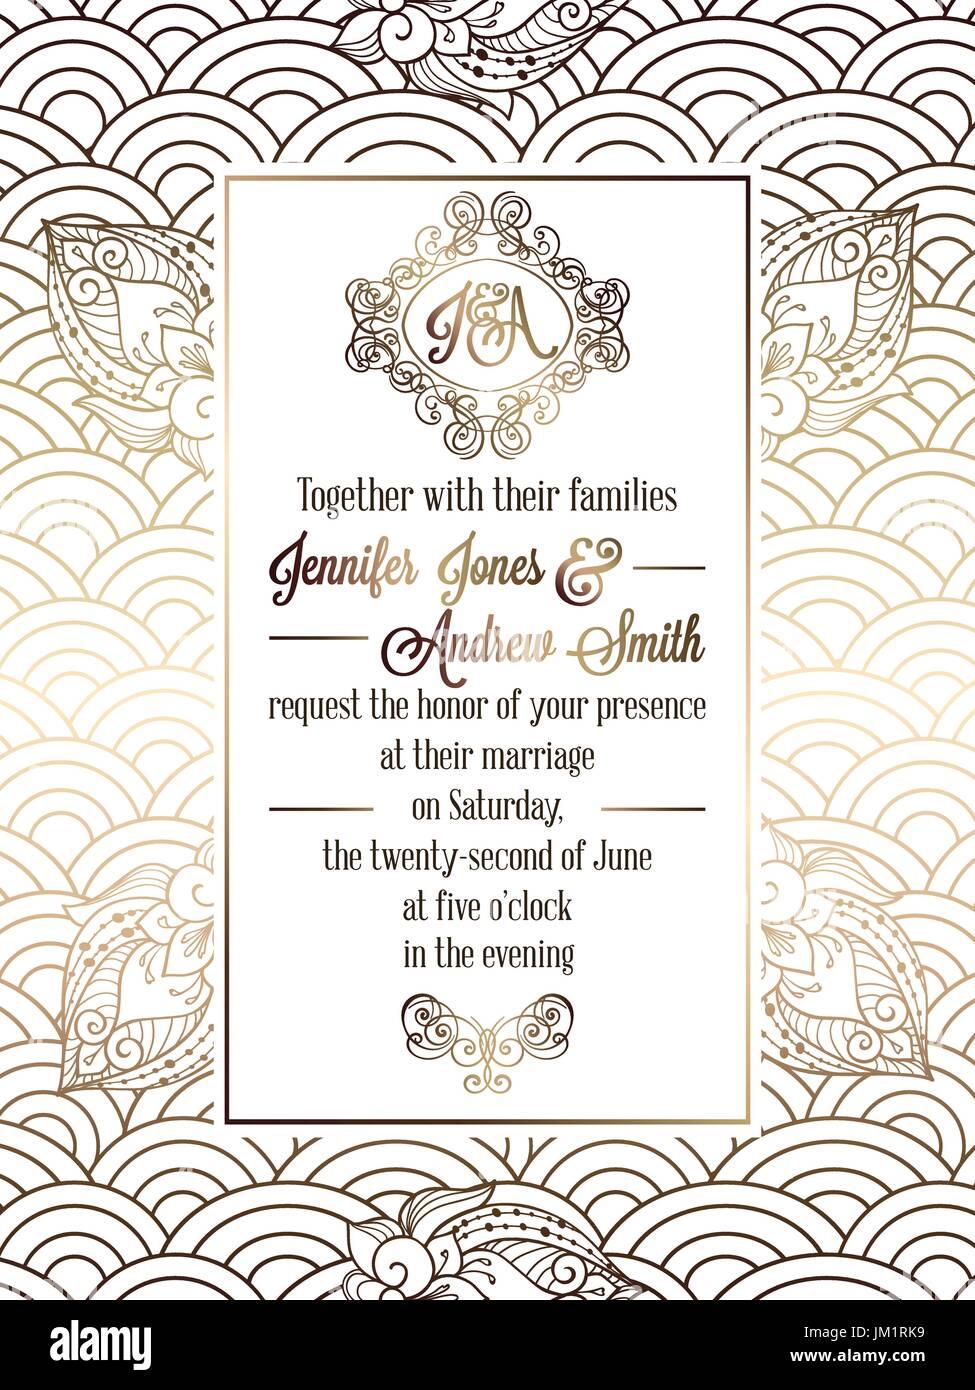 Vintage baroque style wedding invitation card template.. Elegant Stock  Vector Image & Art - Alamy